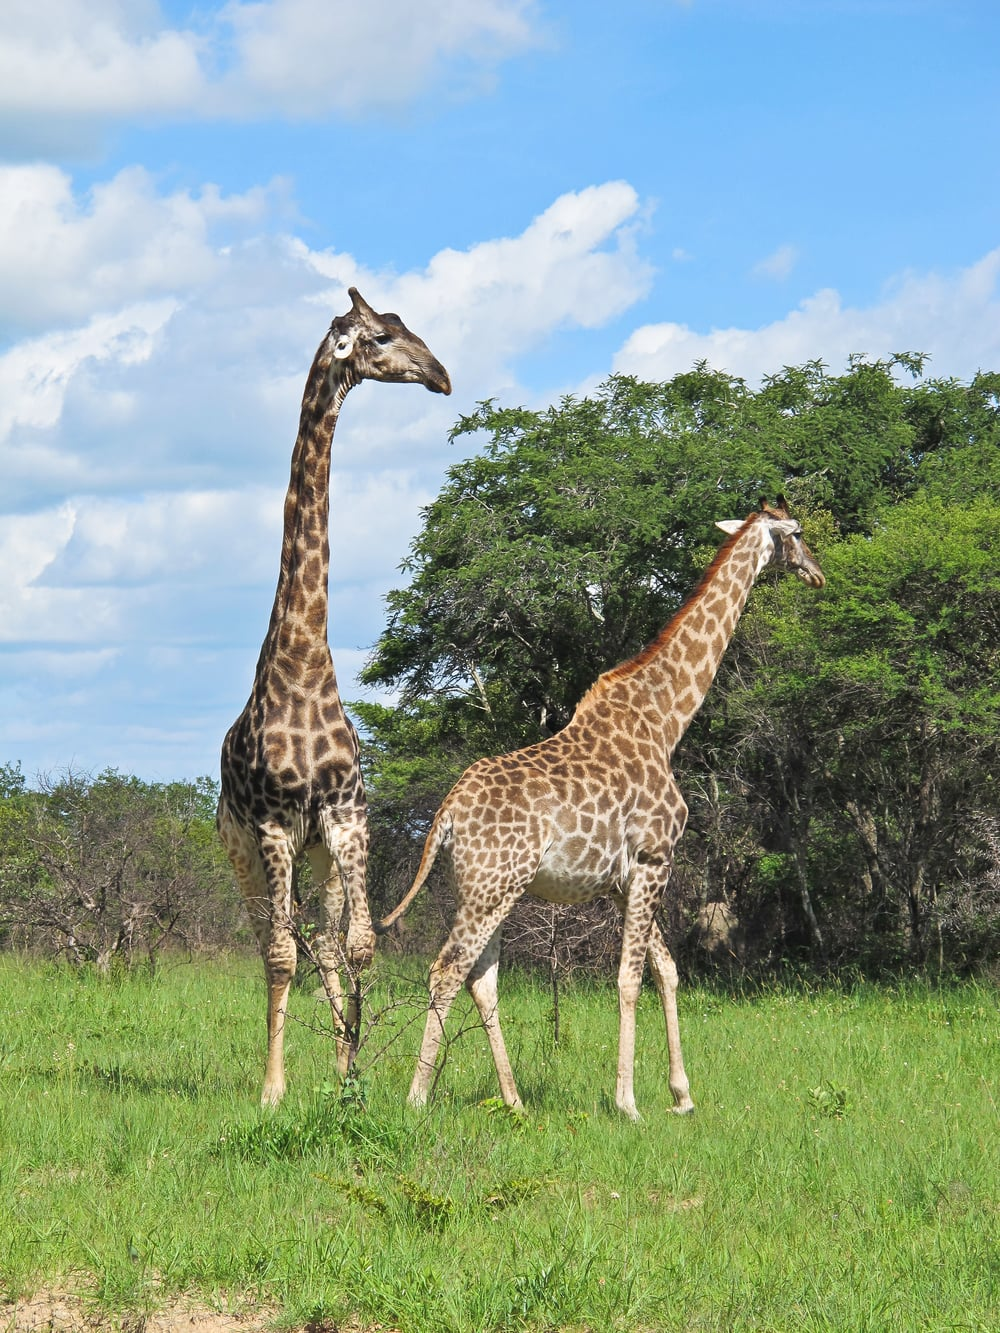 trisa-taro-giraffes-antelope-park-zimbabwe.jpg